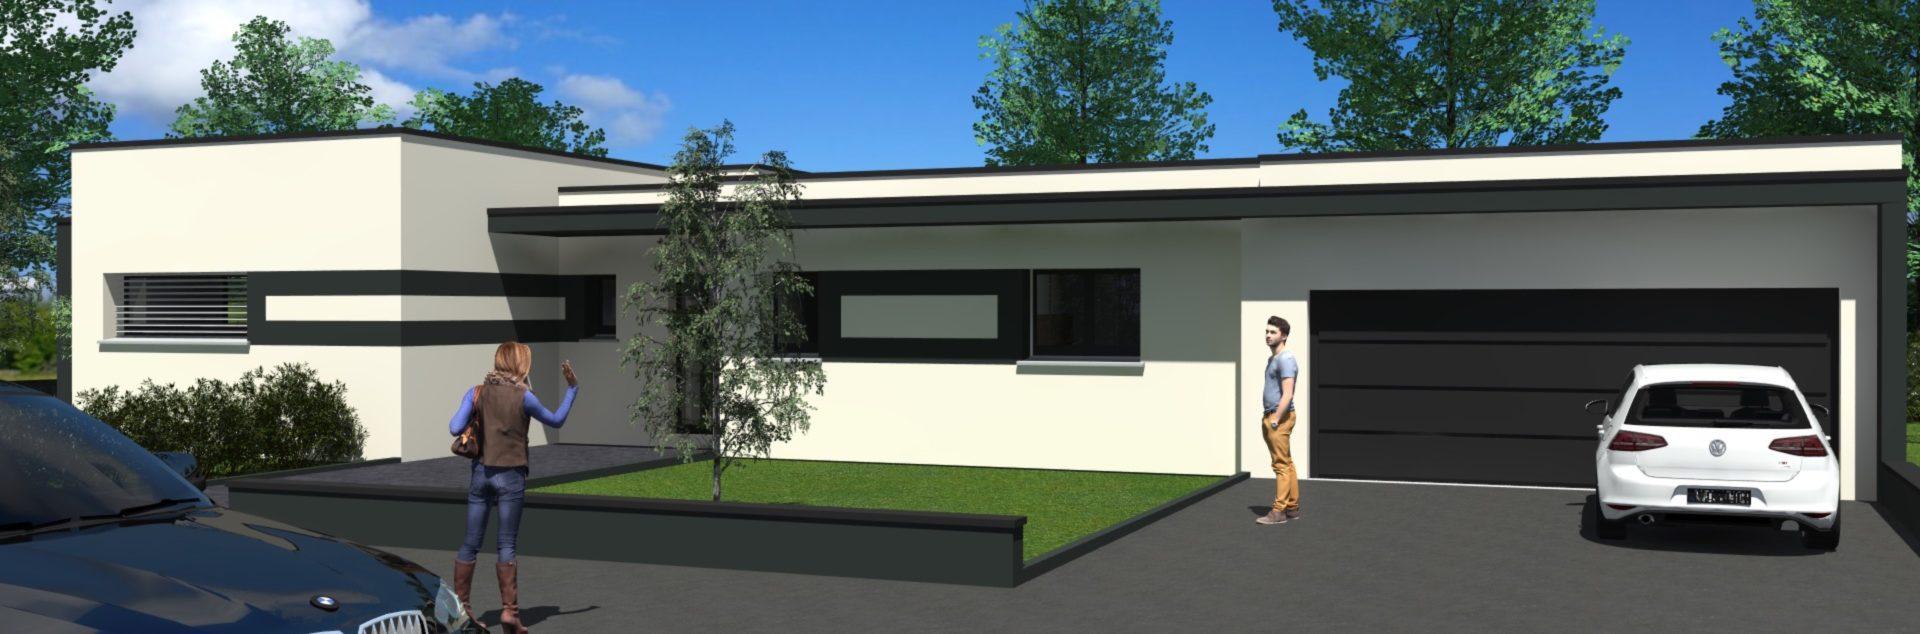 115 m²